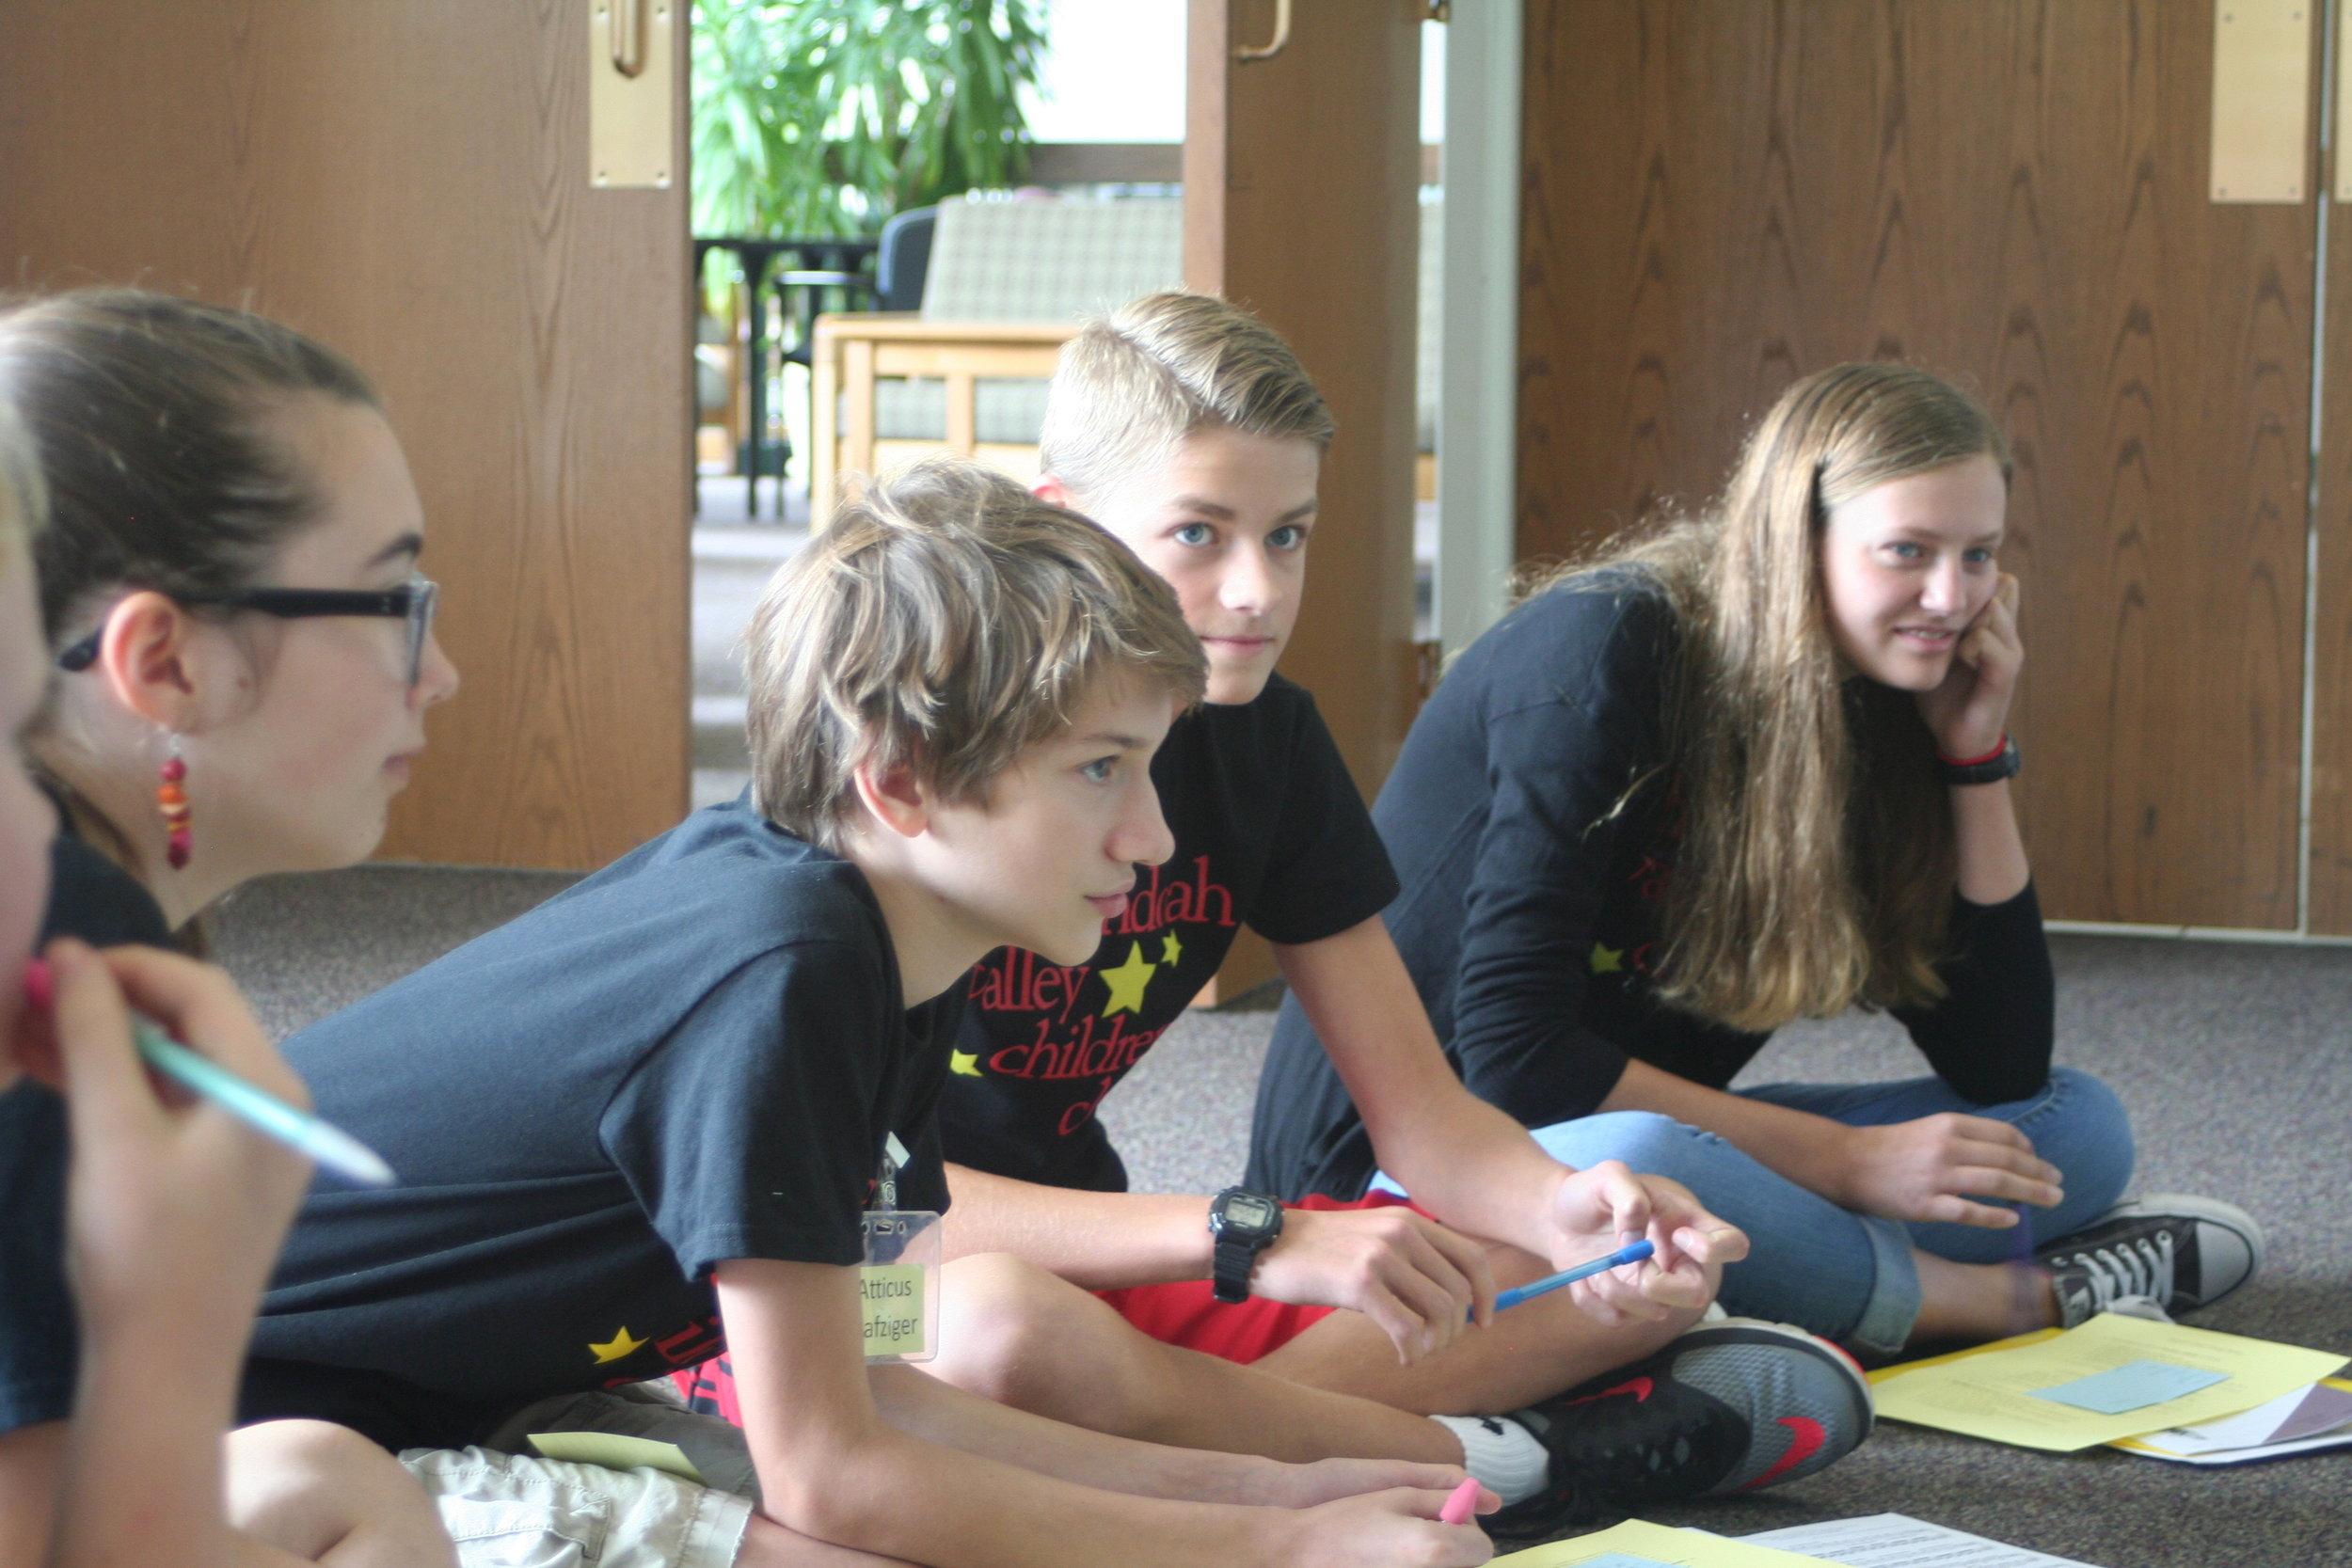 2016 (CC) Atticus, Matthew & Sarah at Retreat-Group Work.JPG